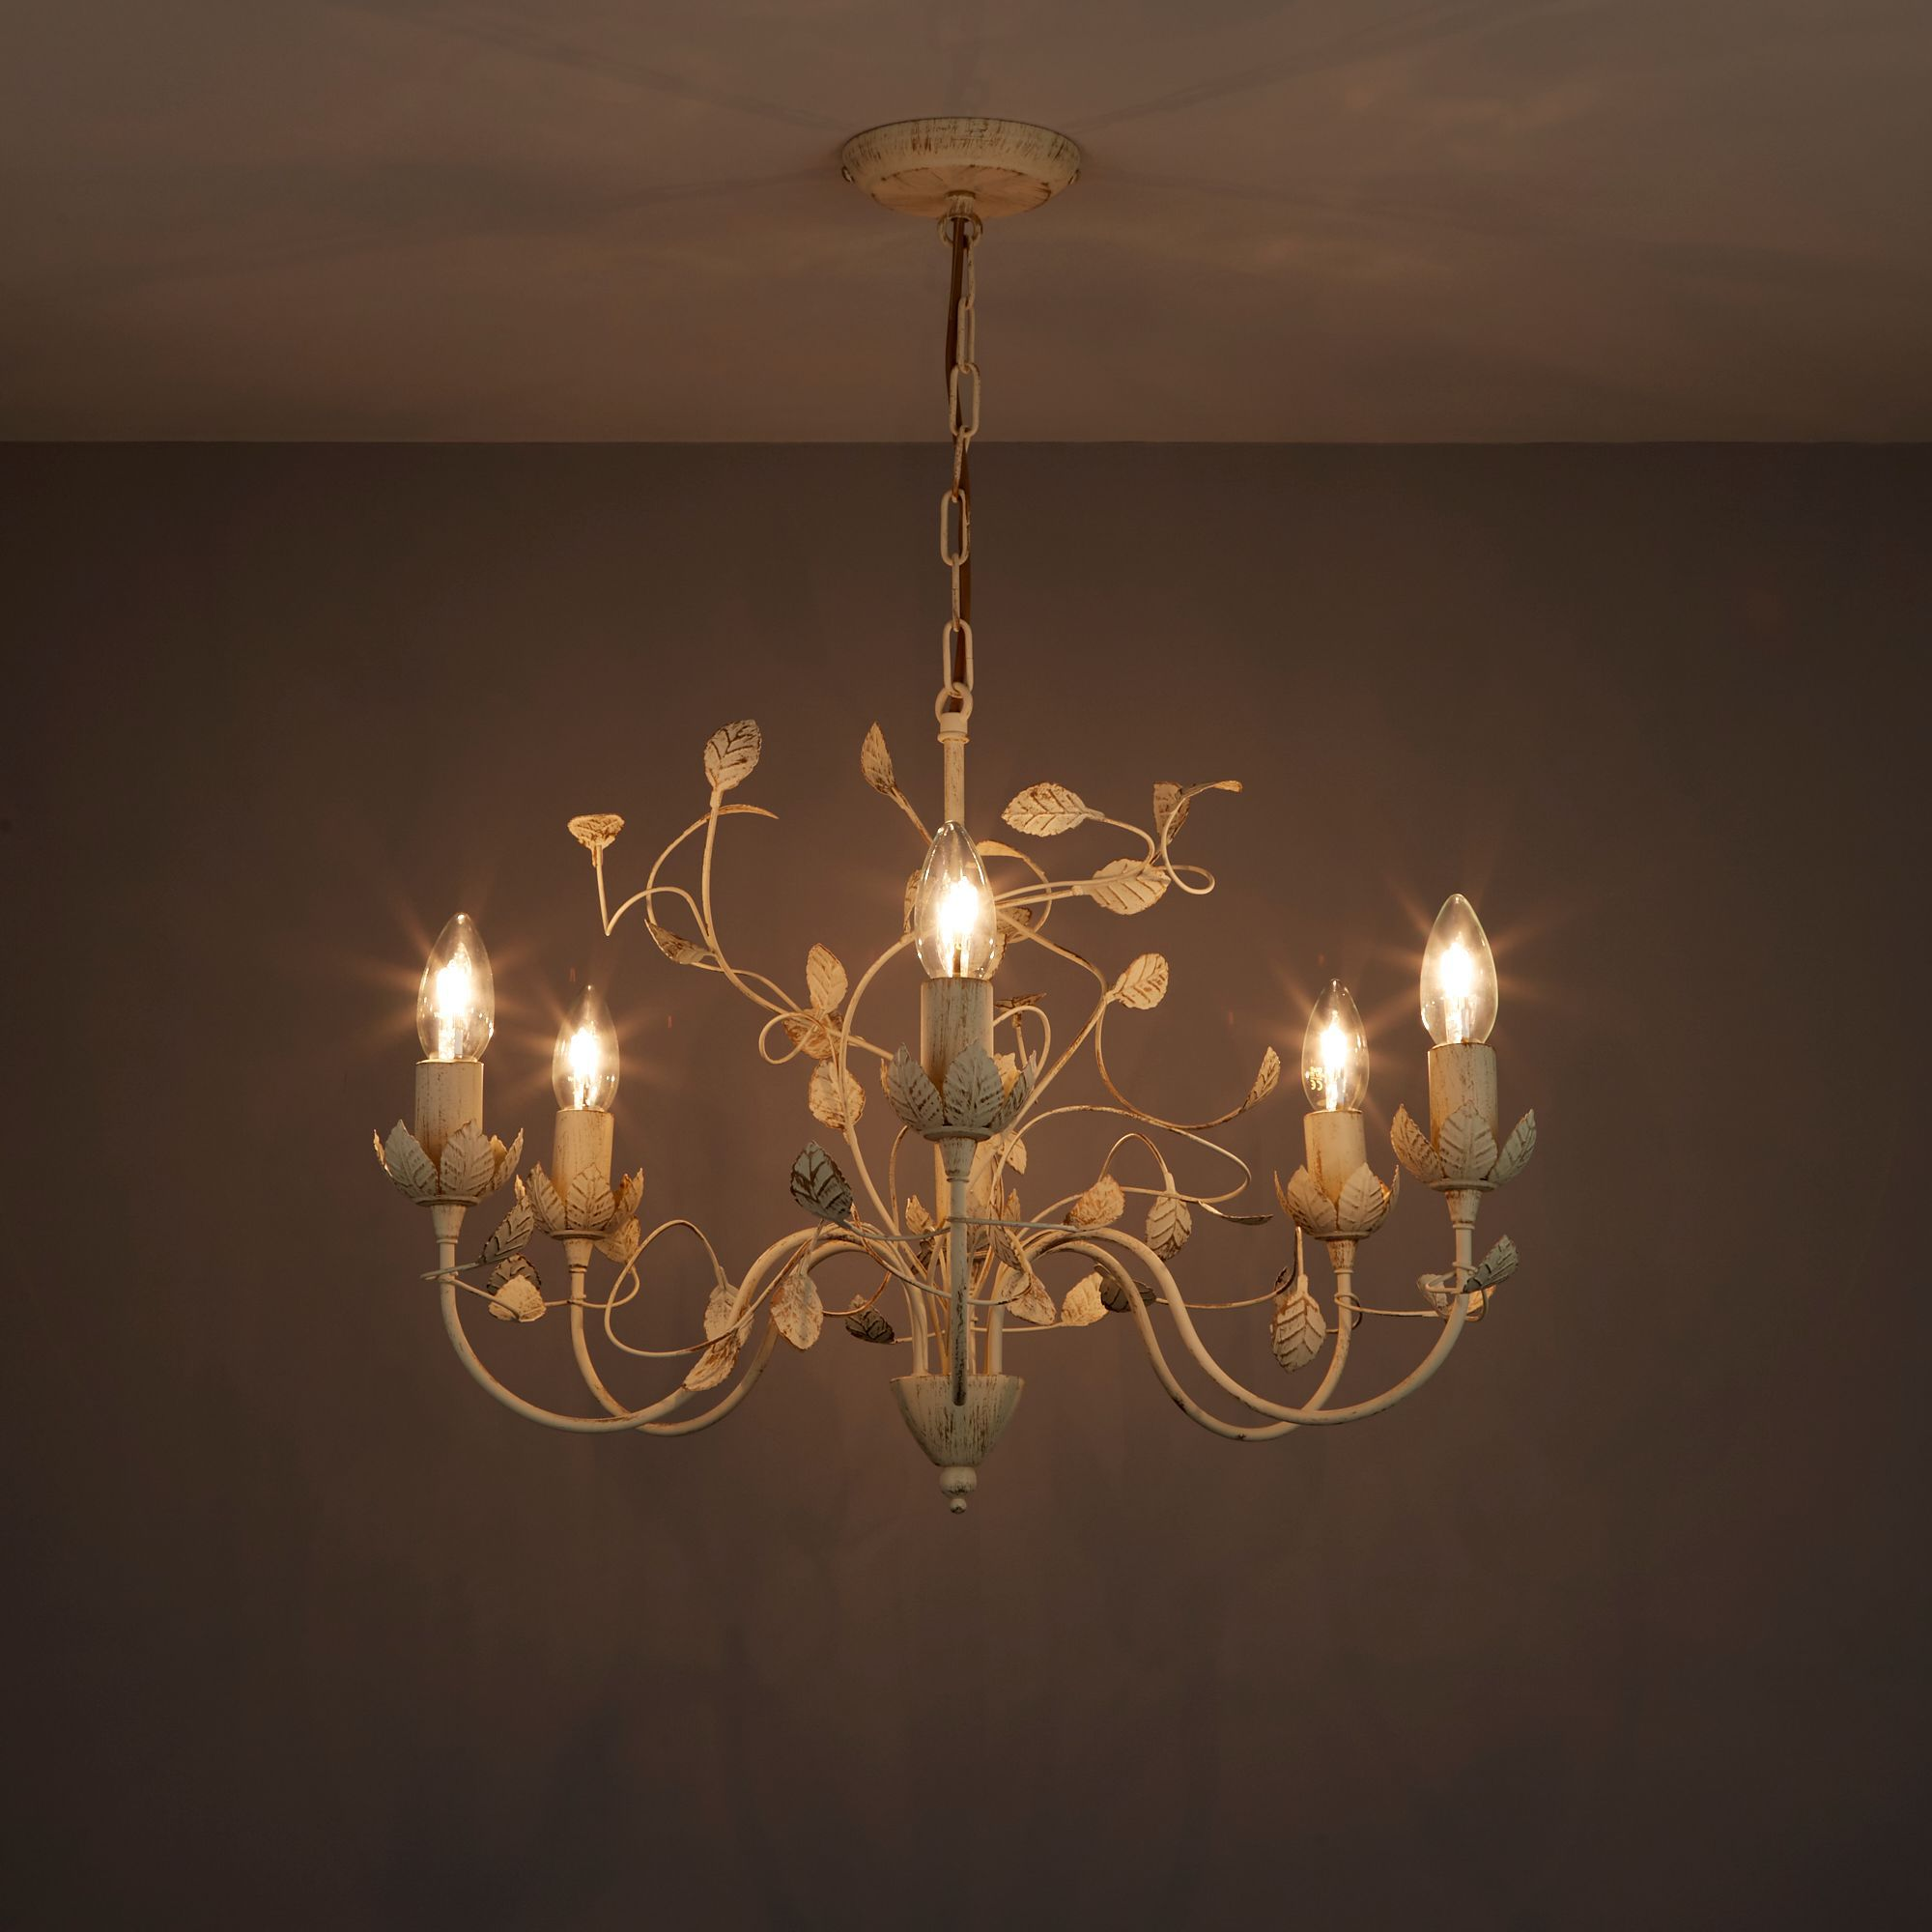 genius great most edison filament bulbs lamp led bulb light chandelier